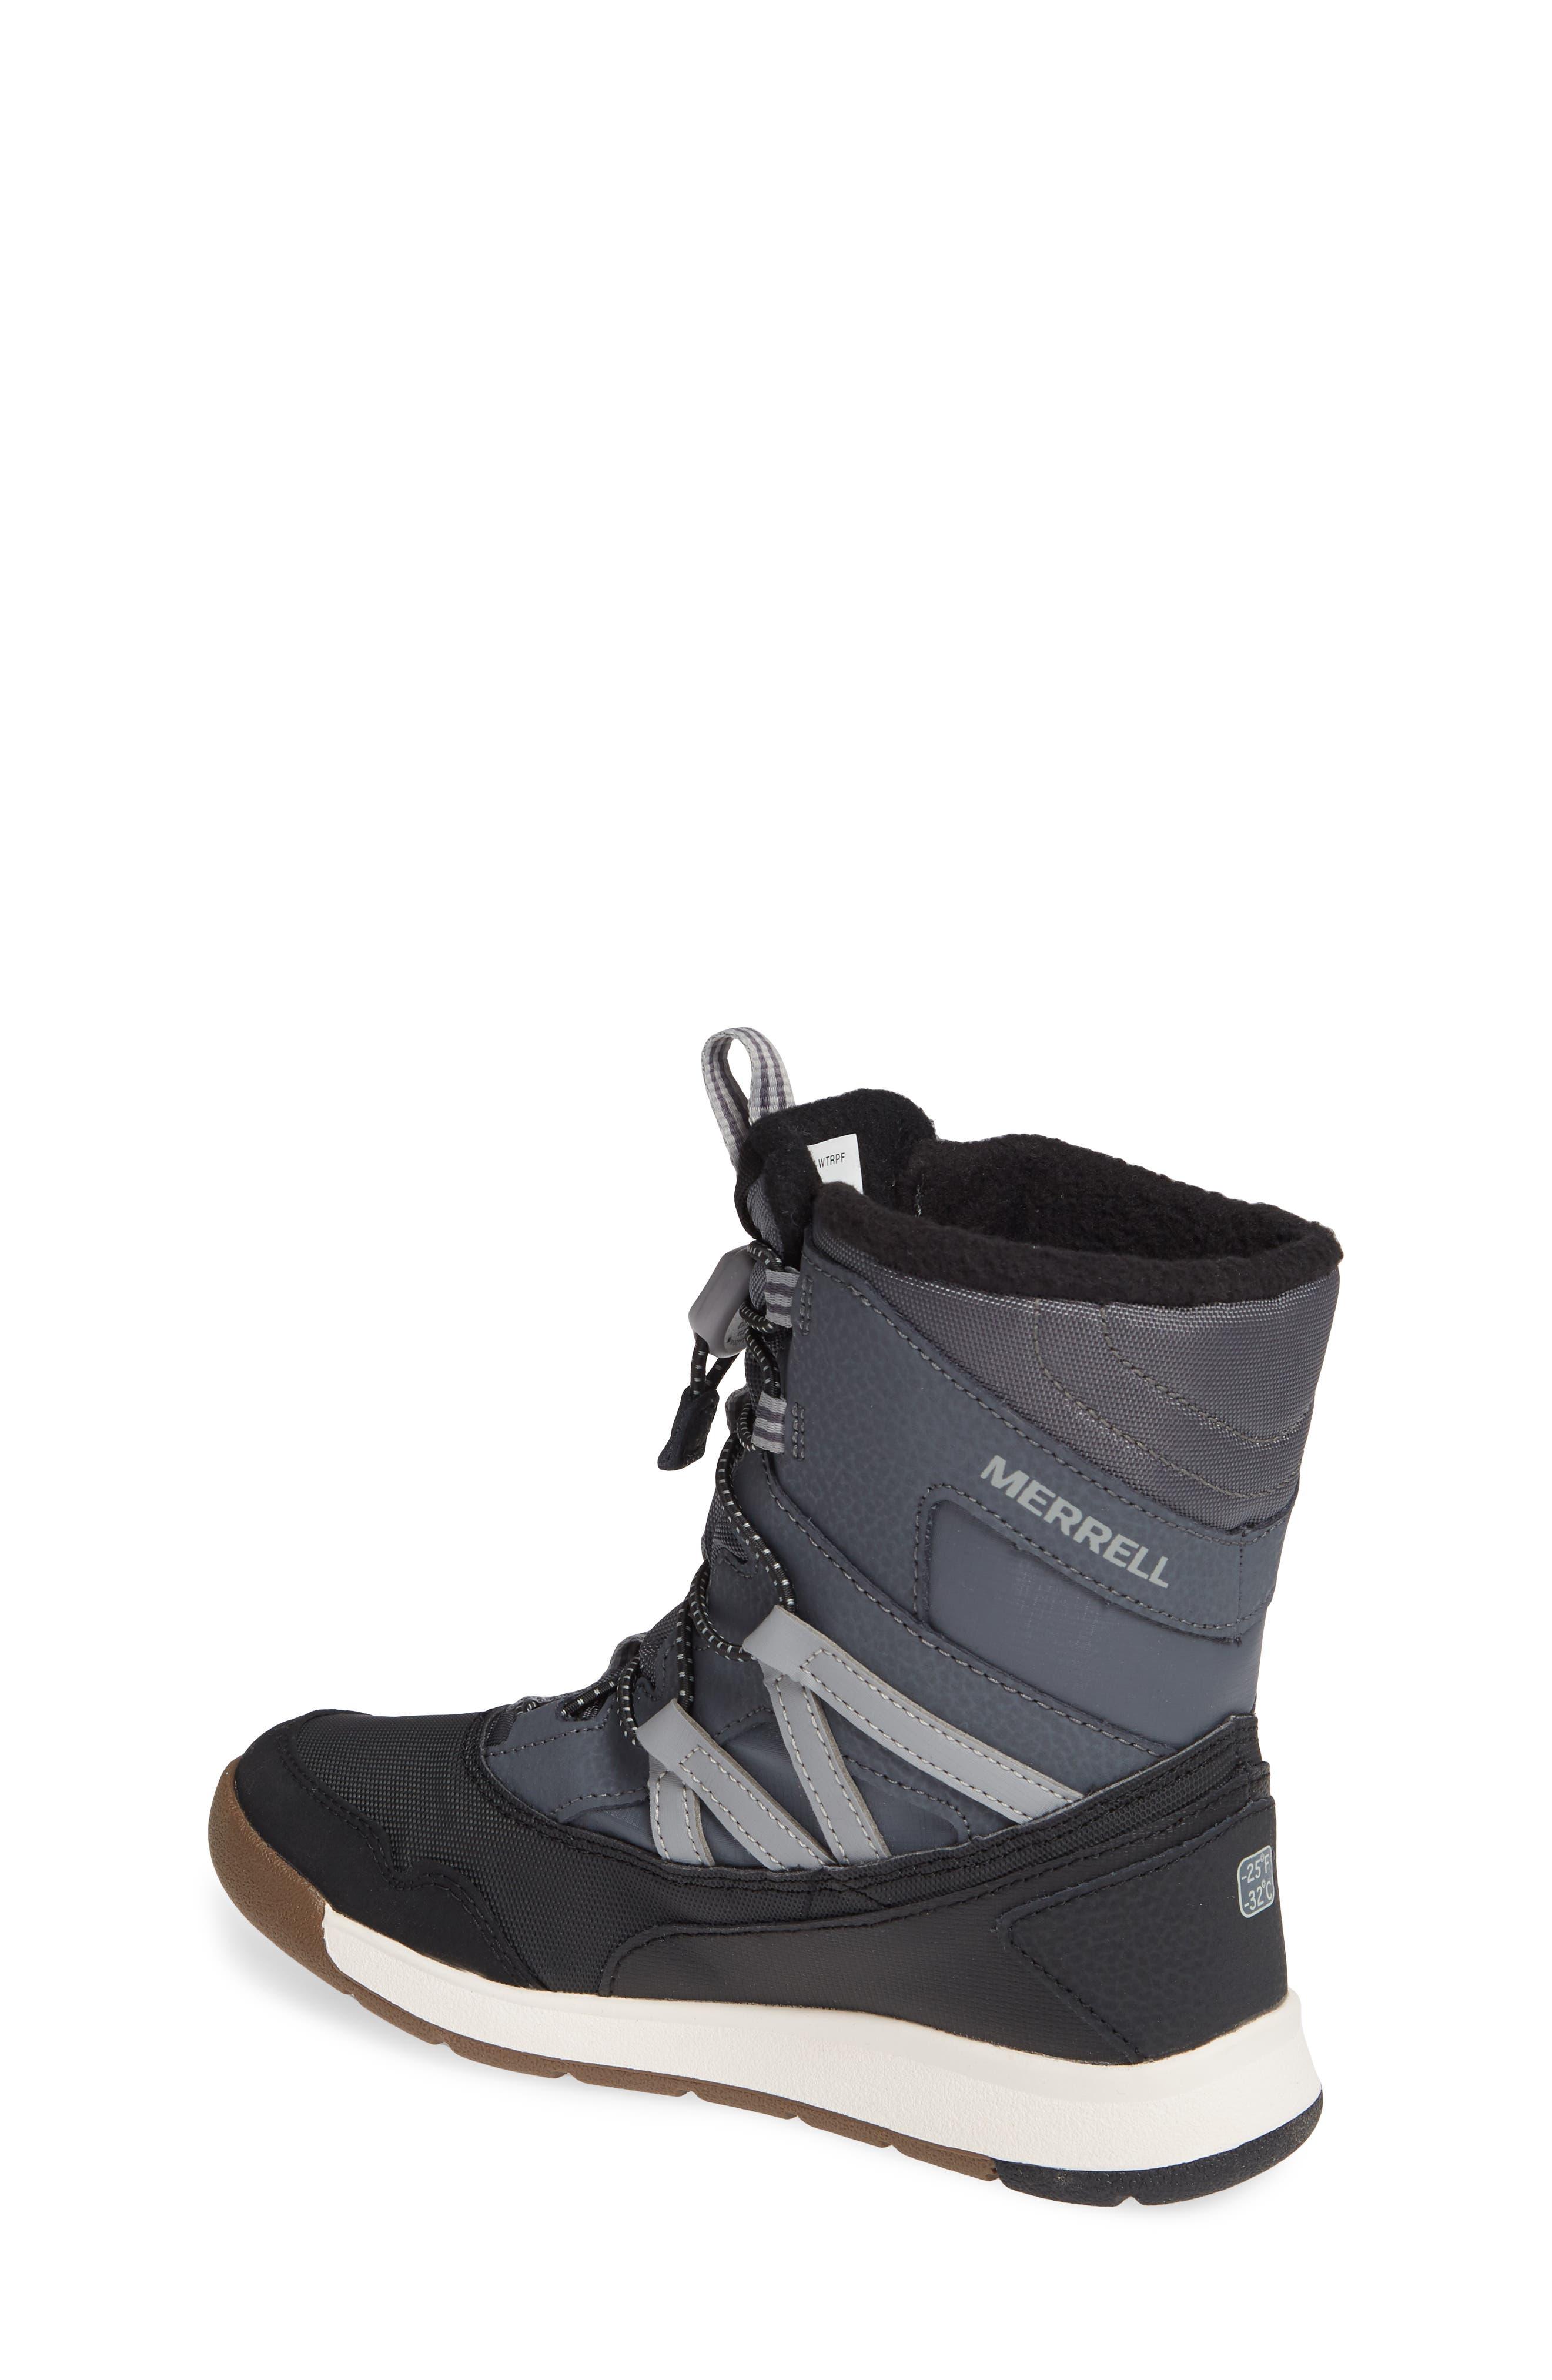 MERRELL, Snow Crush Waterproof Snow Boot, Alternate thumbnail 2, color, 020